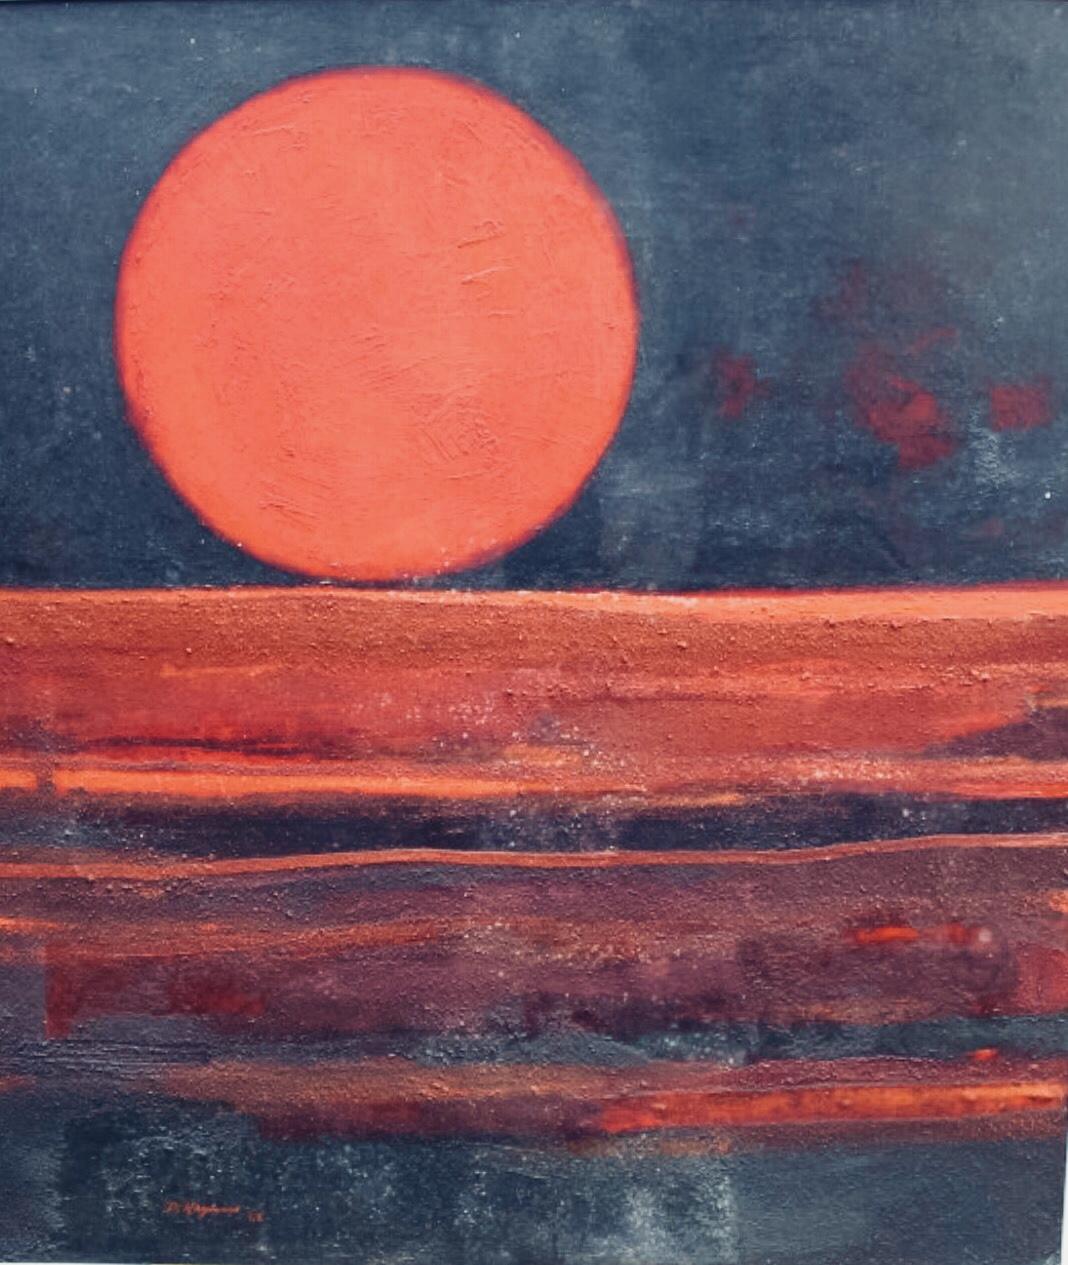 David Hazelwood. Red Horizon, 1968. Oil on mixed media on board.